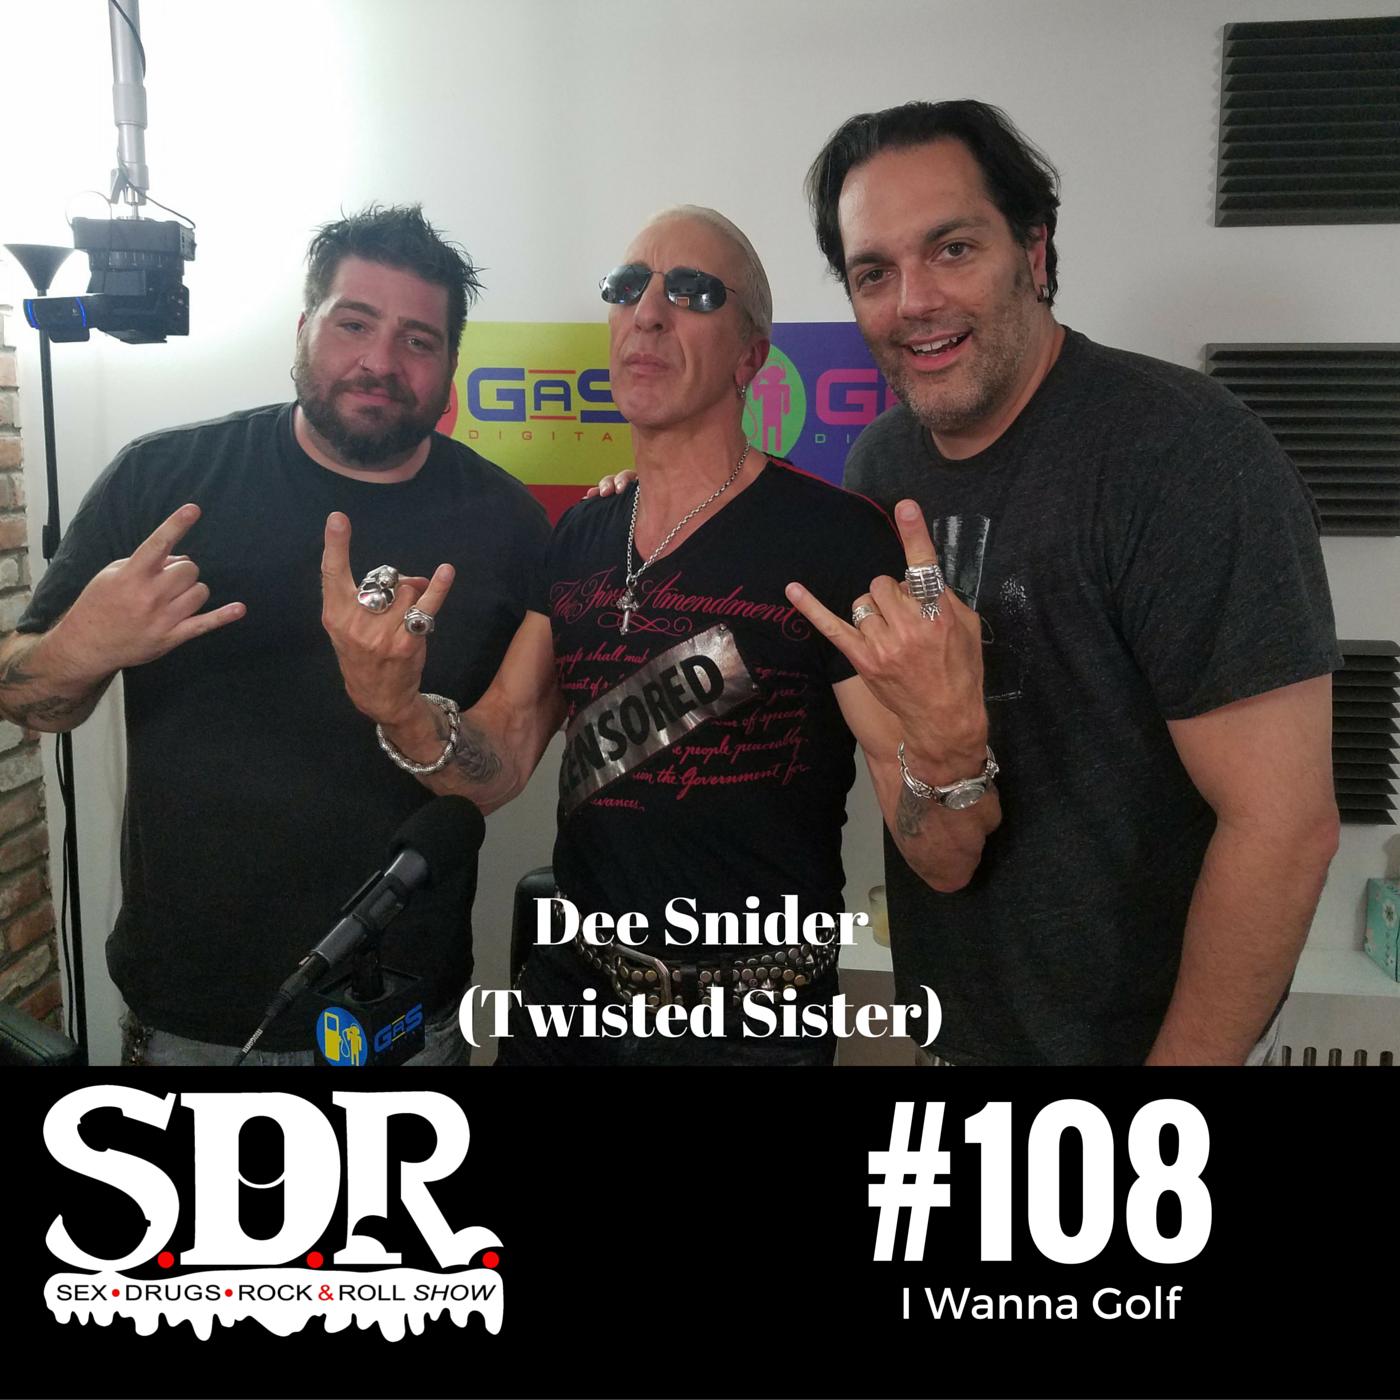 SDR 108 - Dee Snider